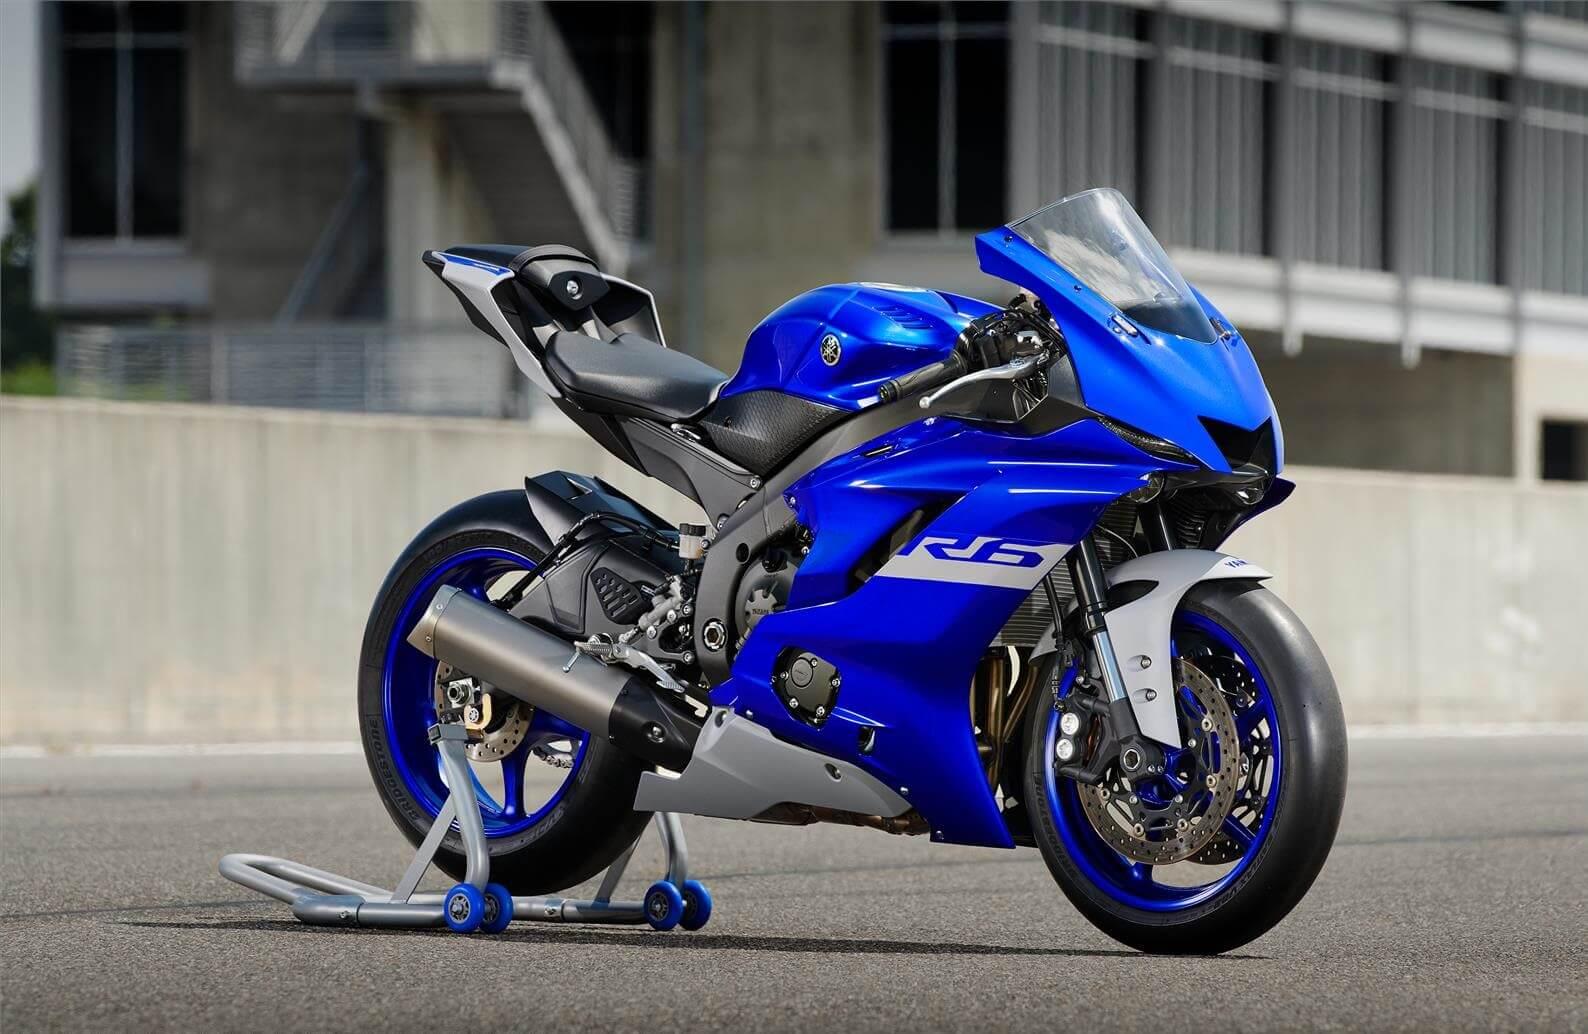 Технические характеристики мотоцикла Yamaha (Ямаха) YZF-R6, обзор, и немного истории